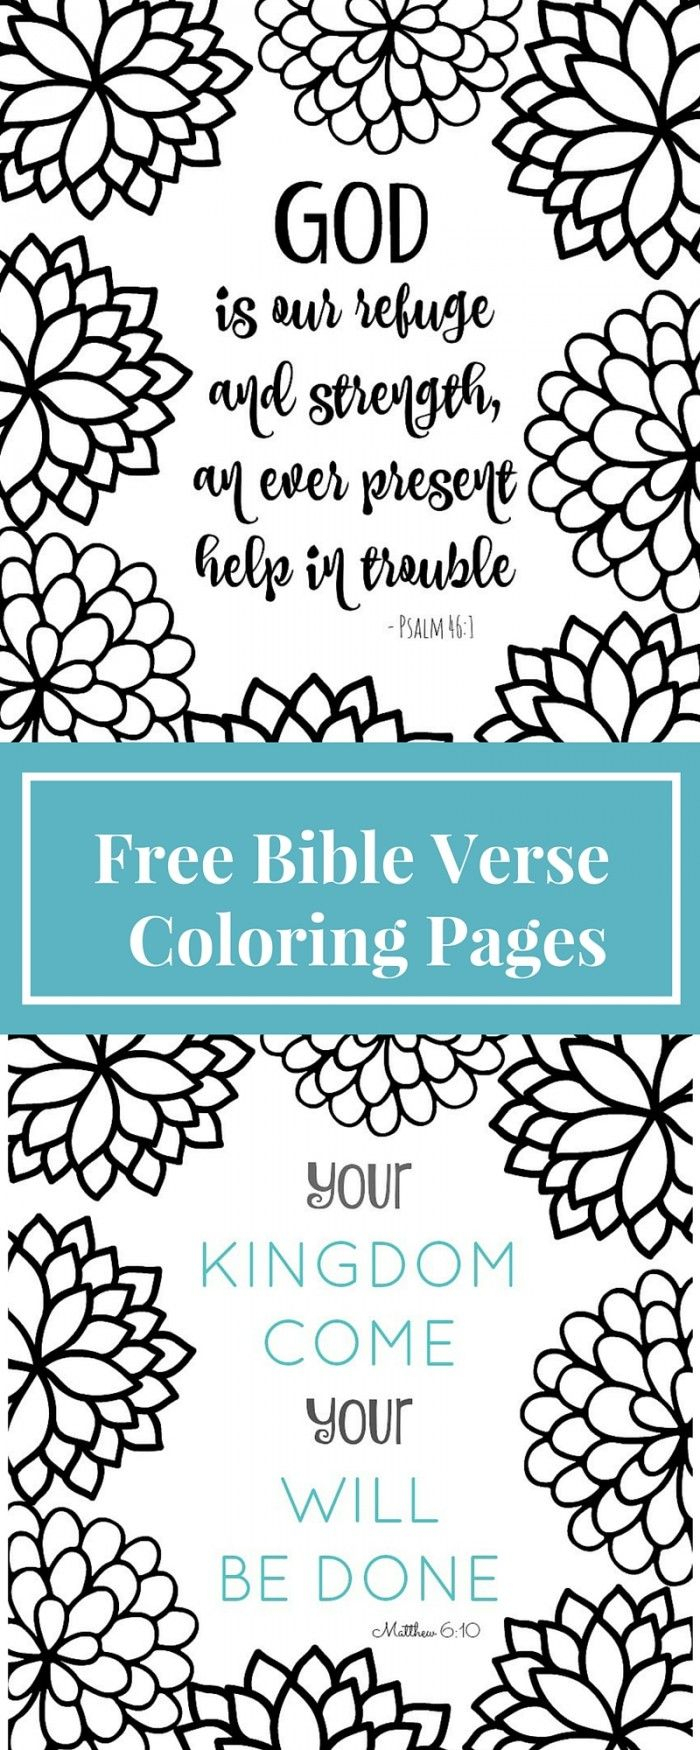 Free Printable Bible Verse Coloring Page   Bible Journaling - Free Printable Bible Coloring Pages With Verses